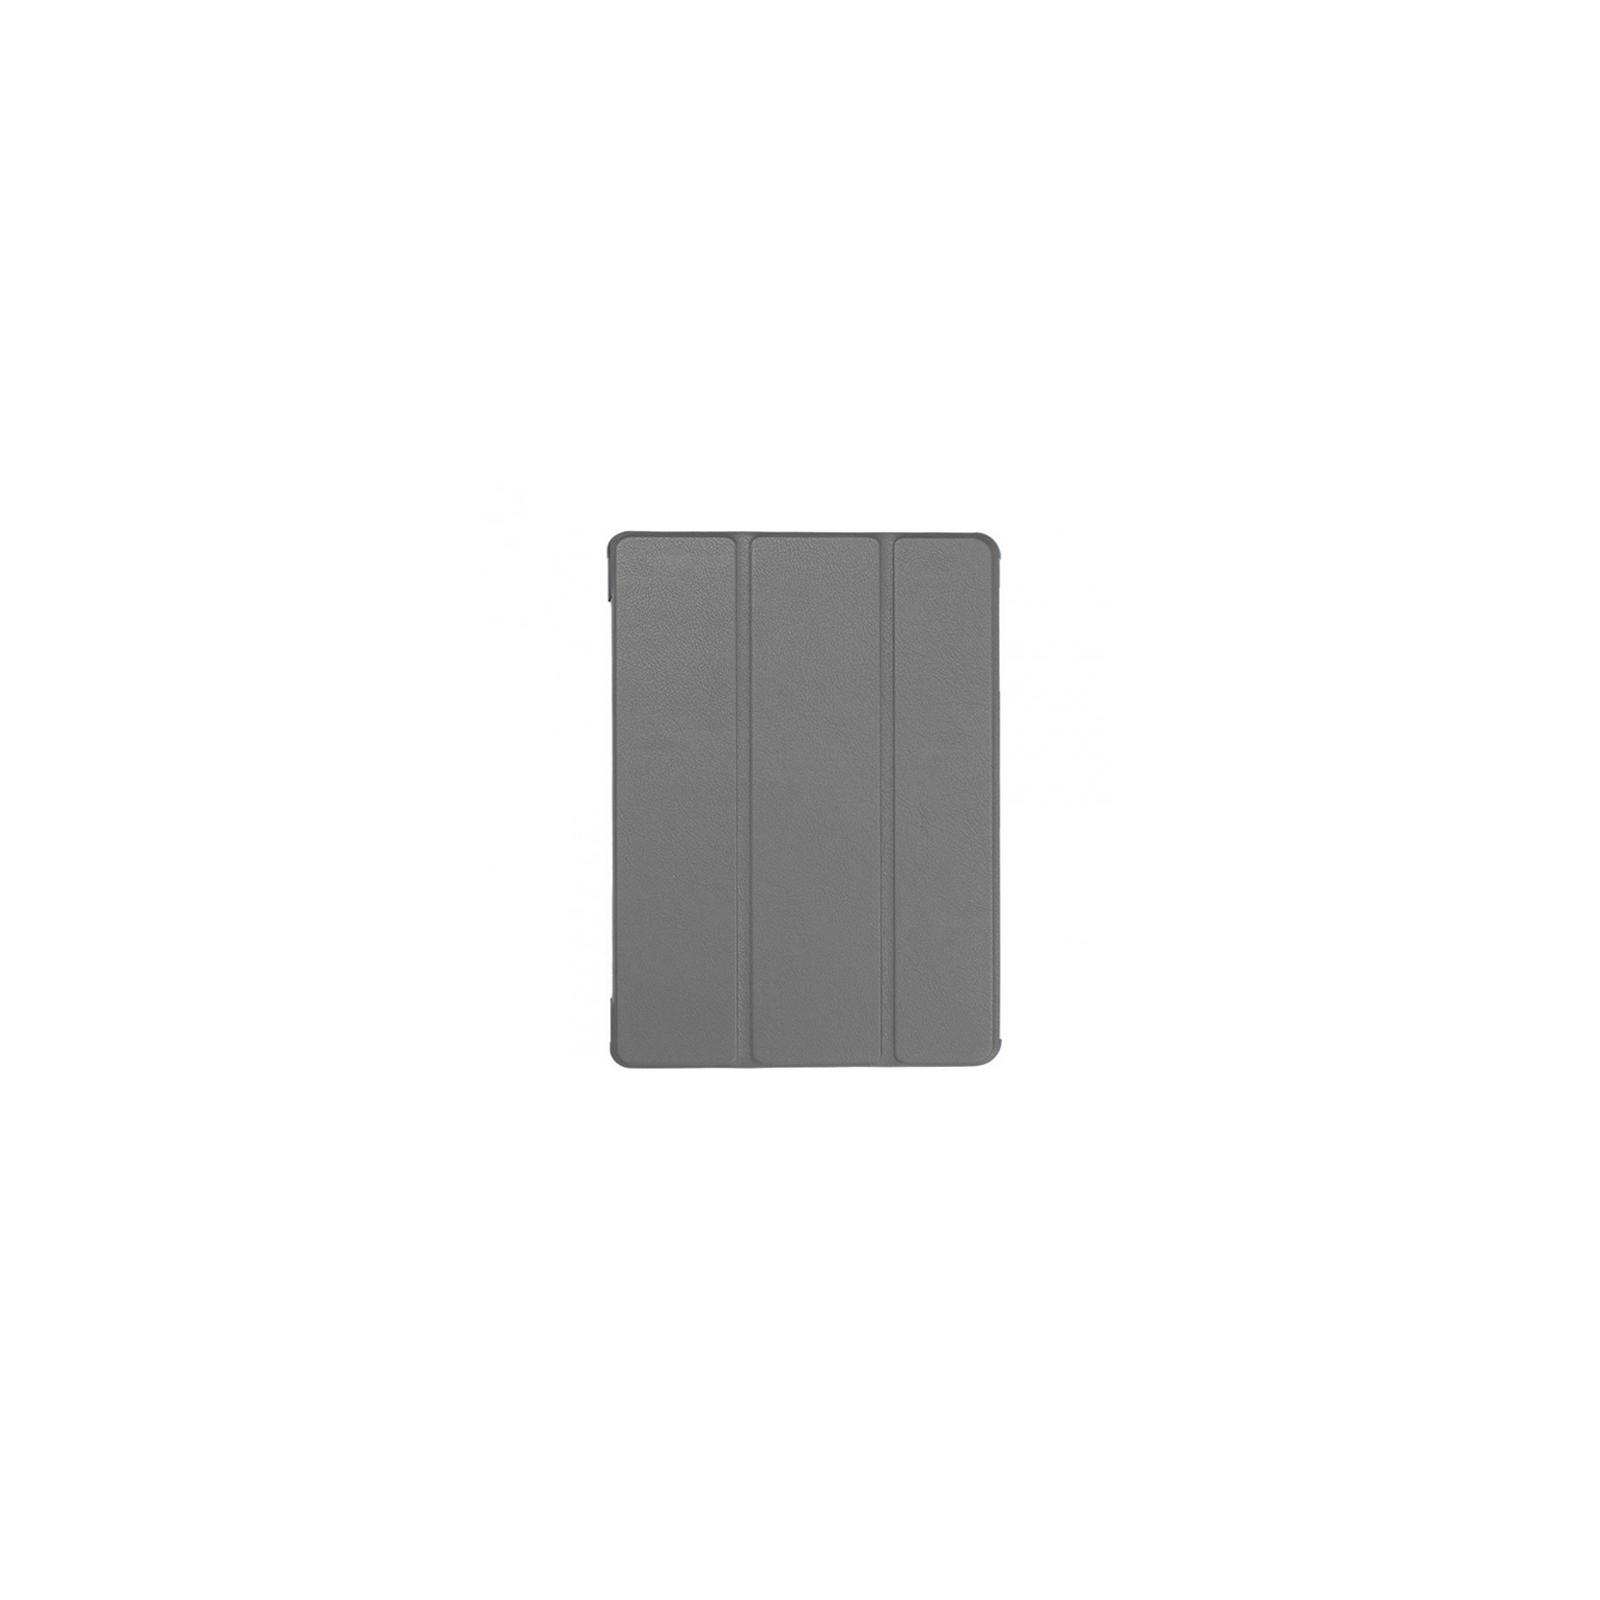 Чехол для планшета BeCover Pencil для Apple iPad 10.2 2019/2020 Gray (704148)